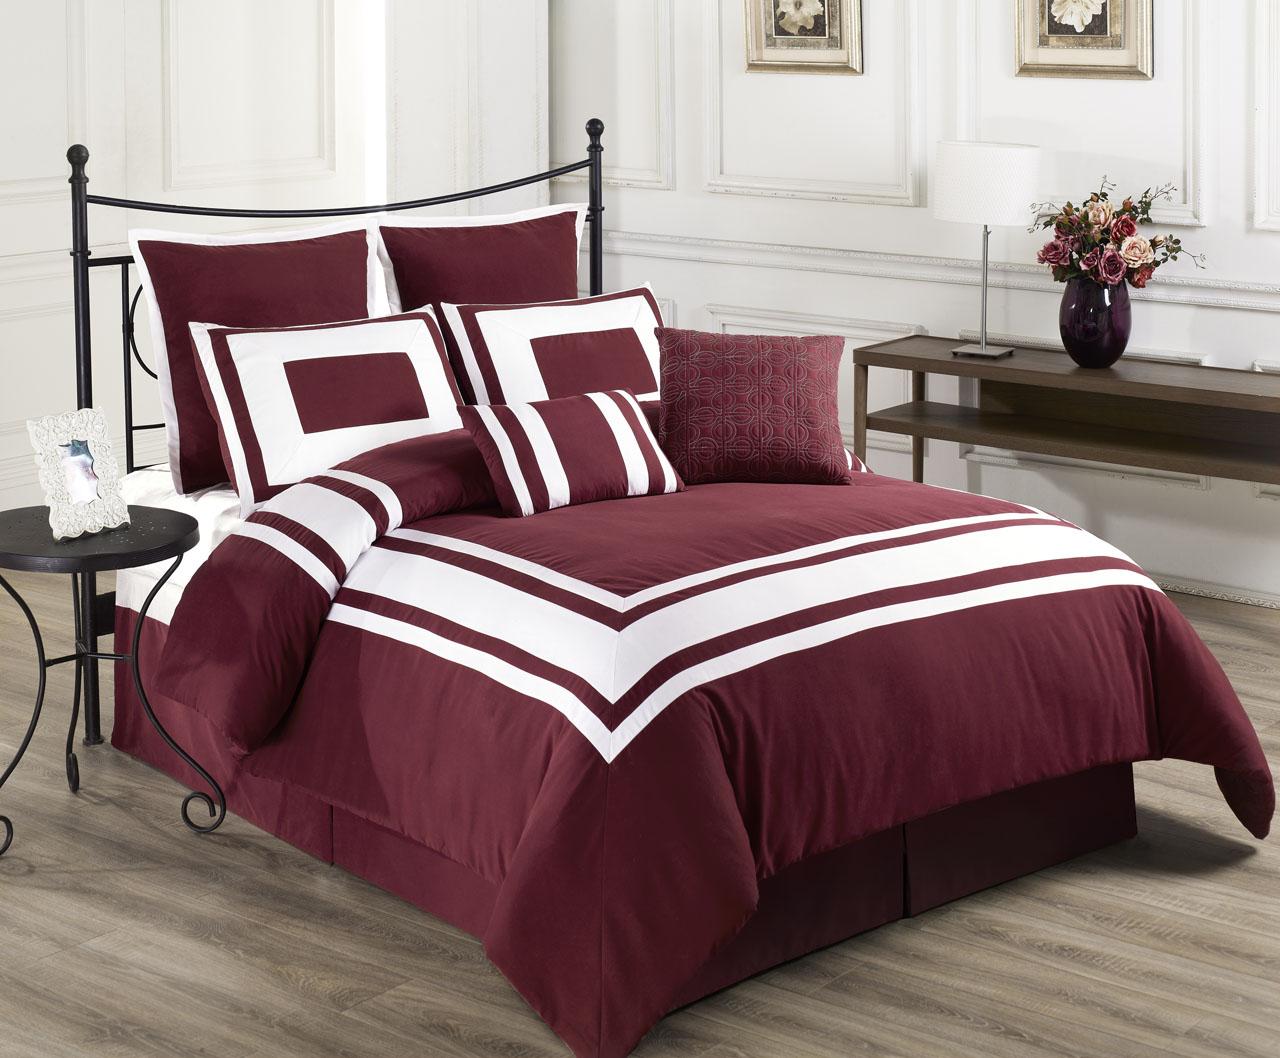 8 Piece Lux Decor Comforter Set Ebay